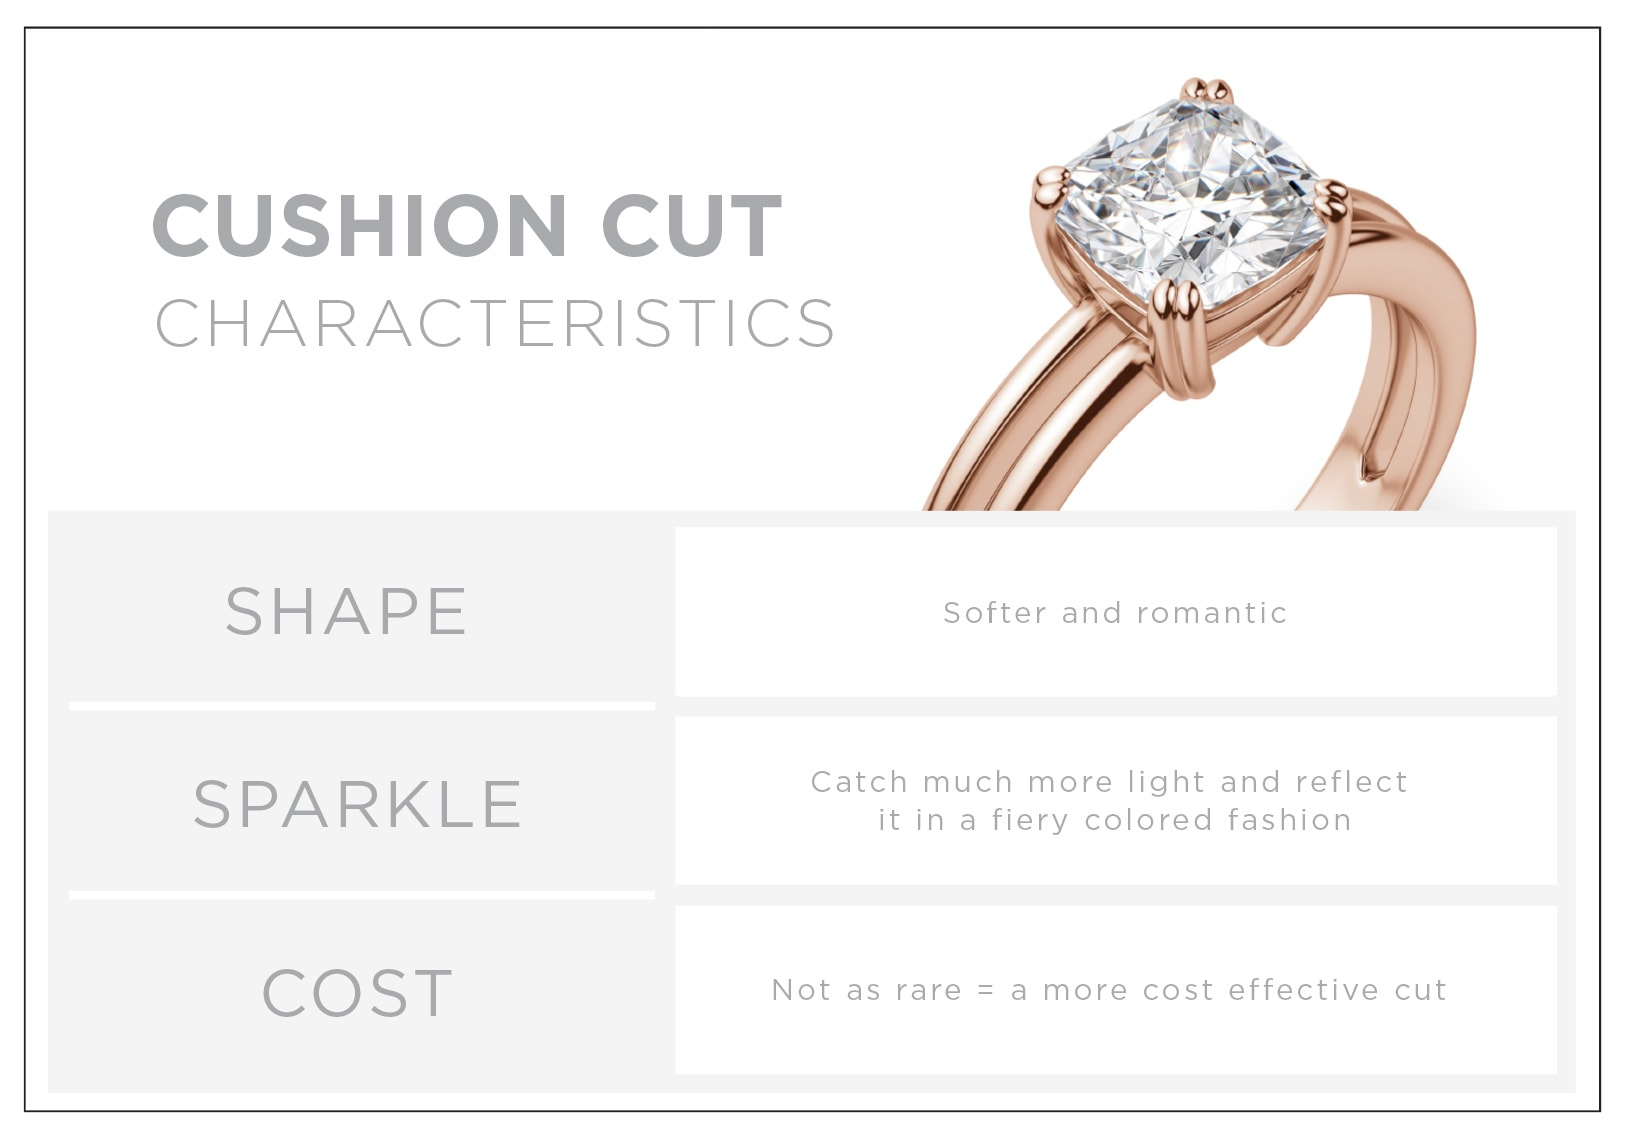 Characteristics of a cushion cut diamond